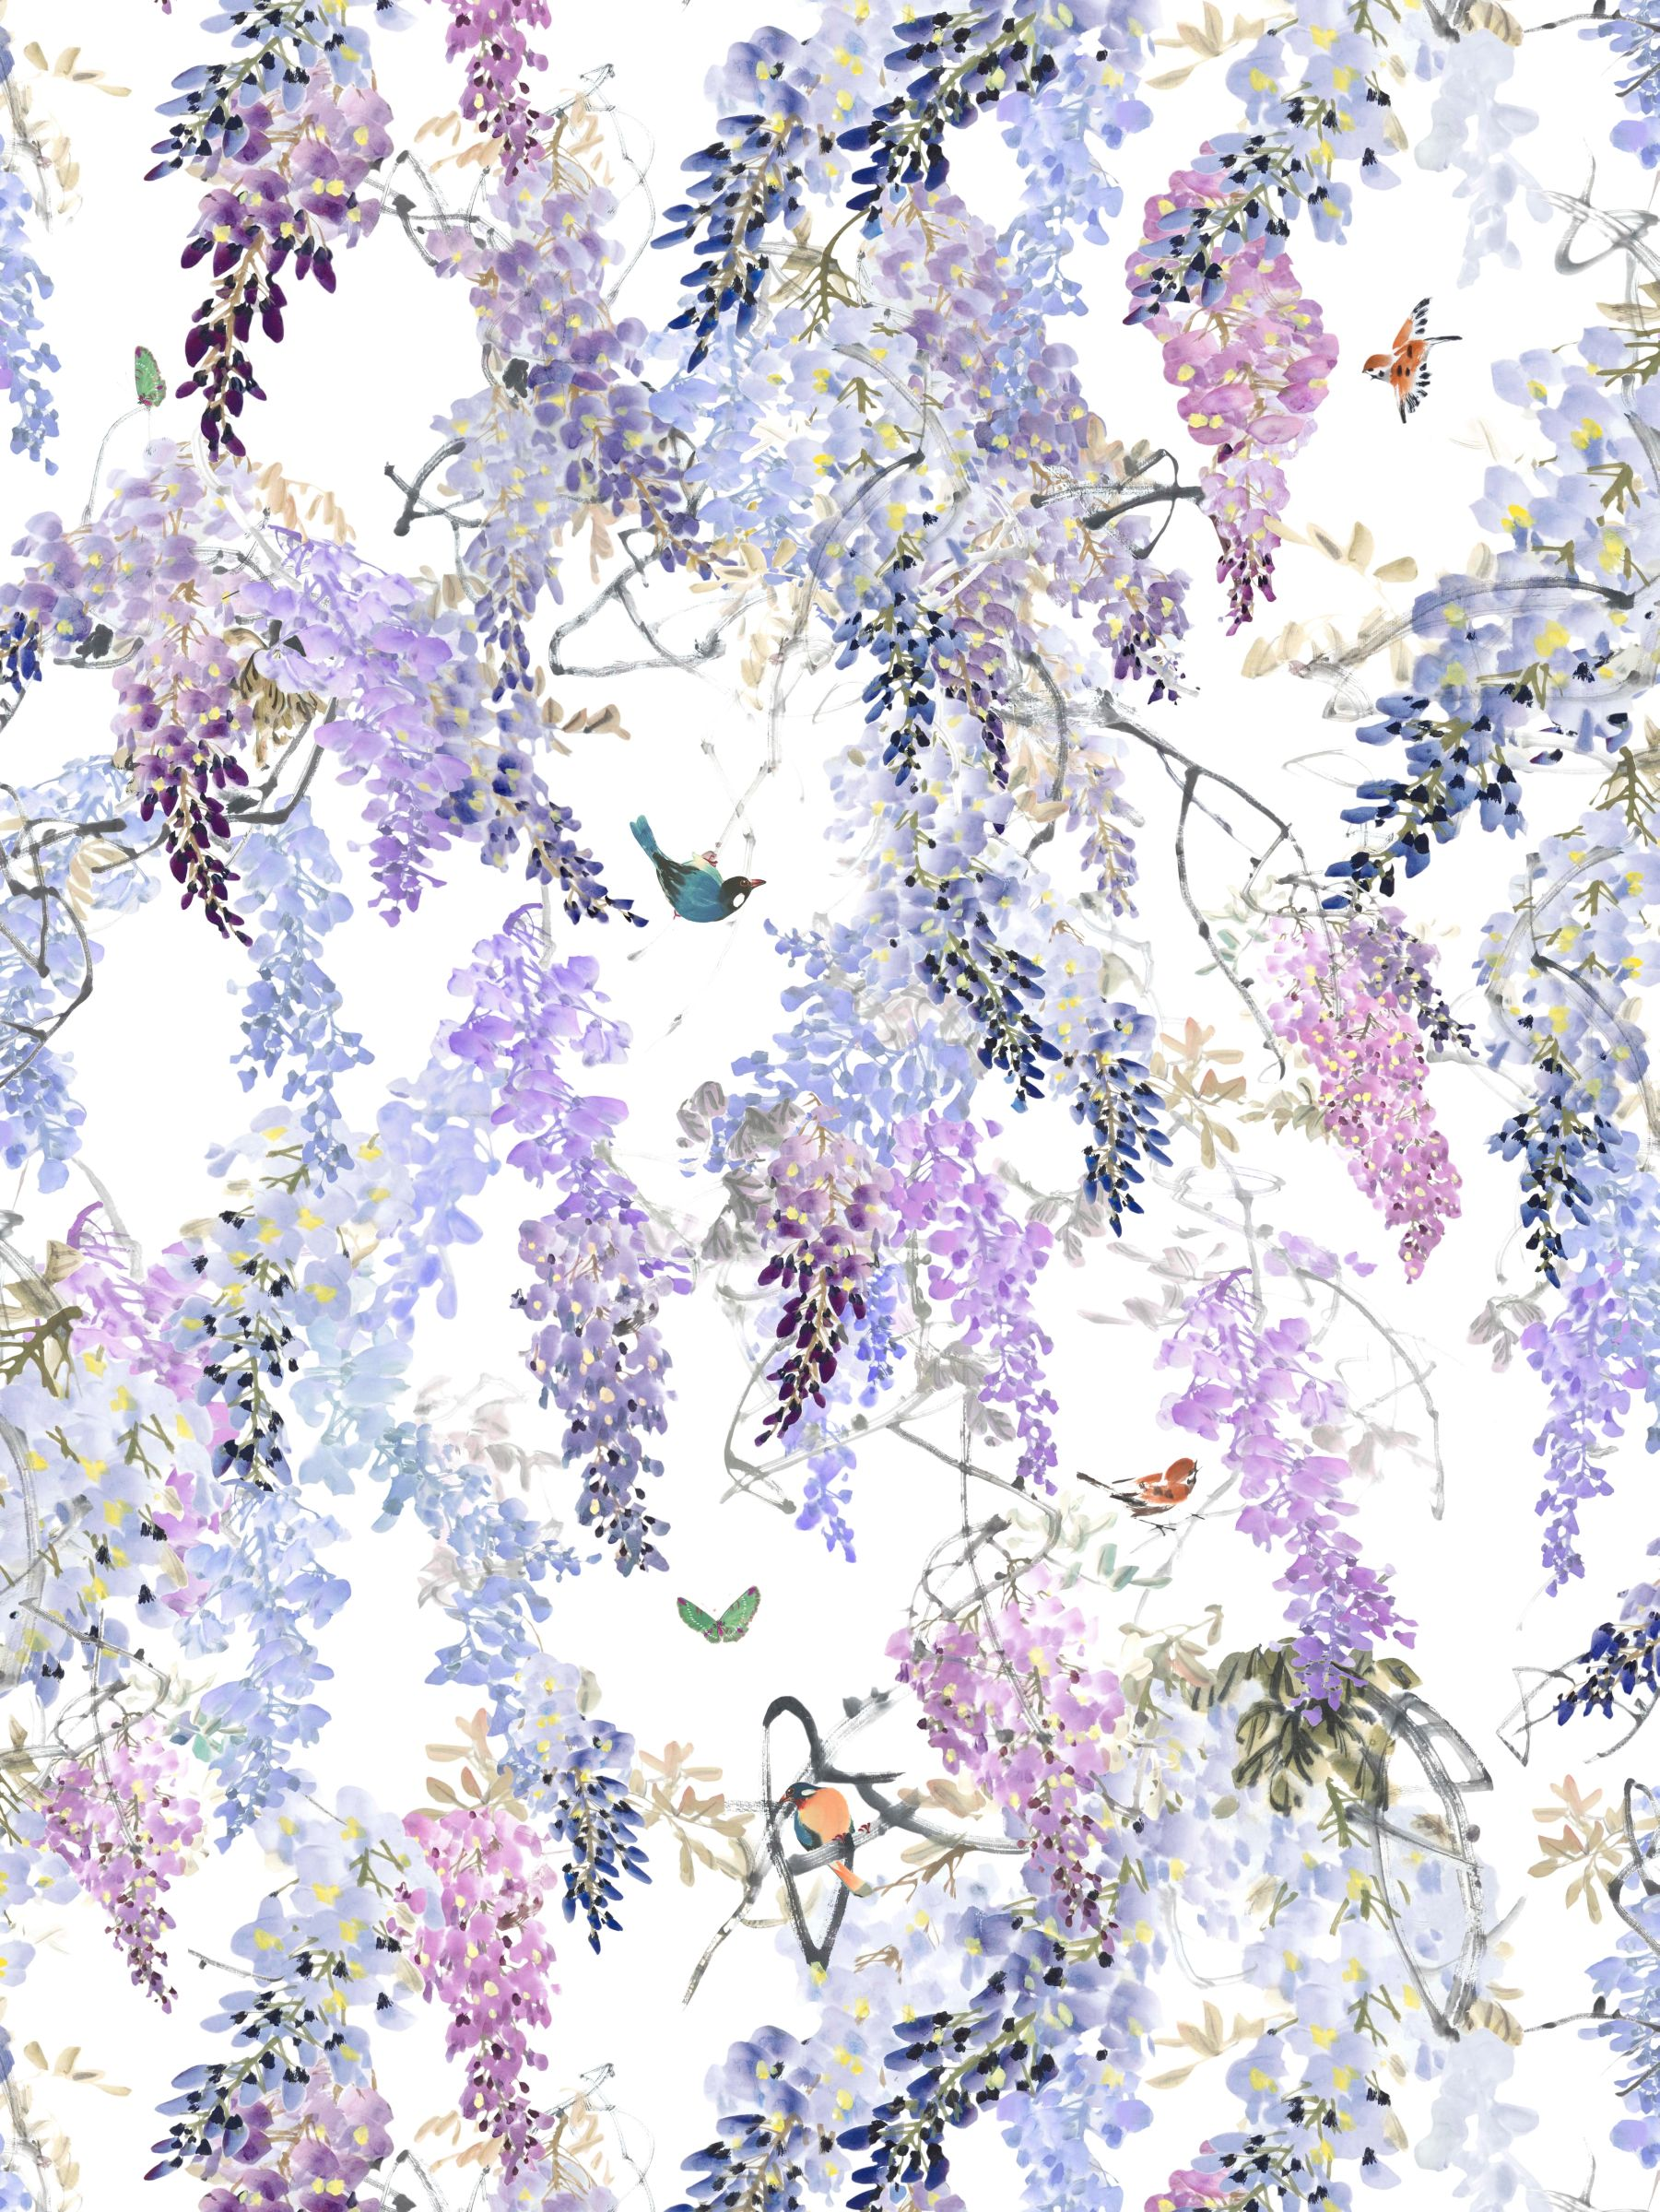 Sanderson Sanderson Waterperry Wisteria Falls Wallpaper Lilac 216297, Panel B